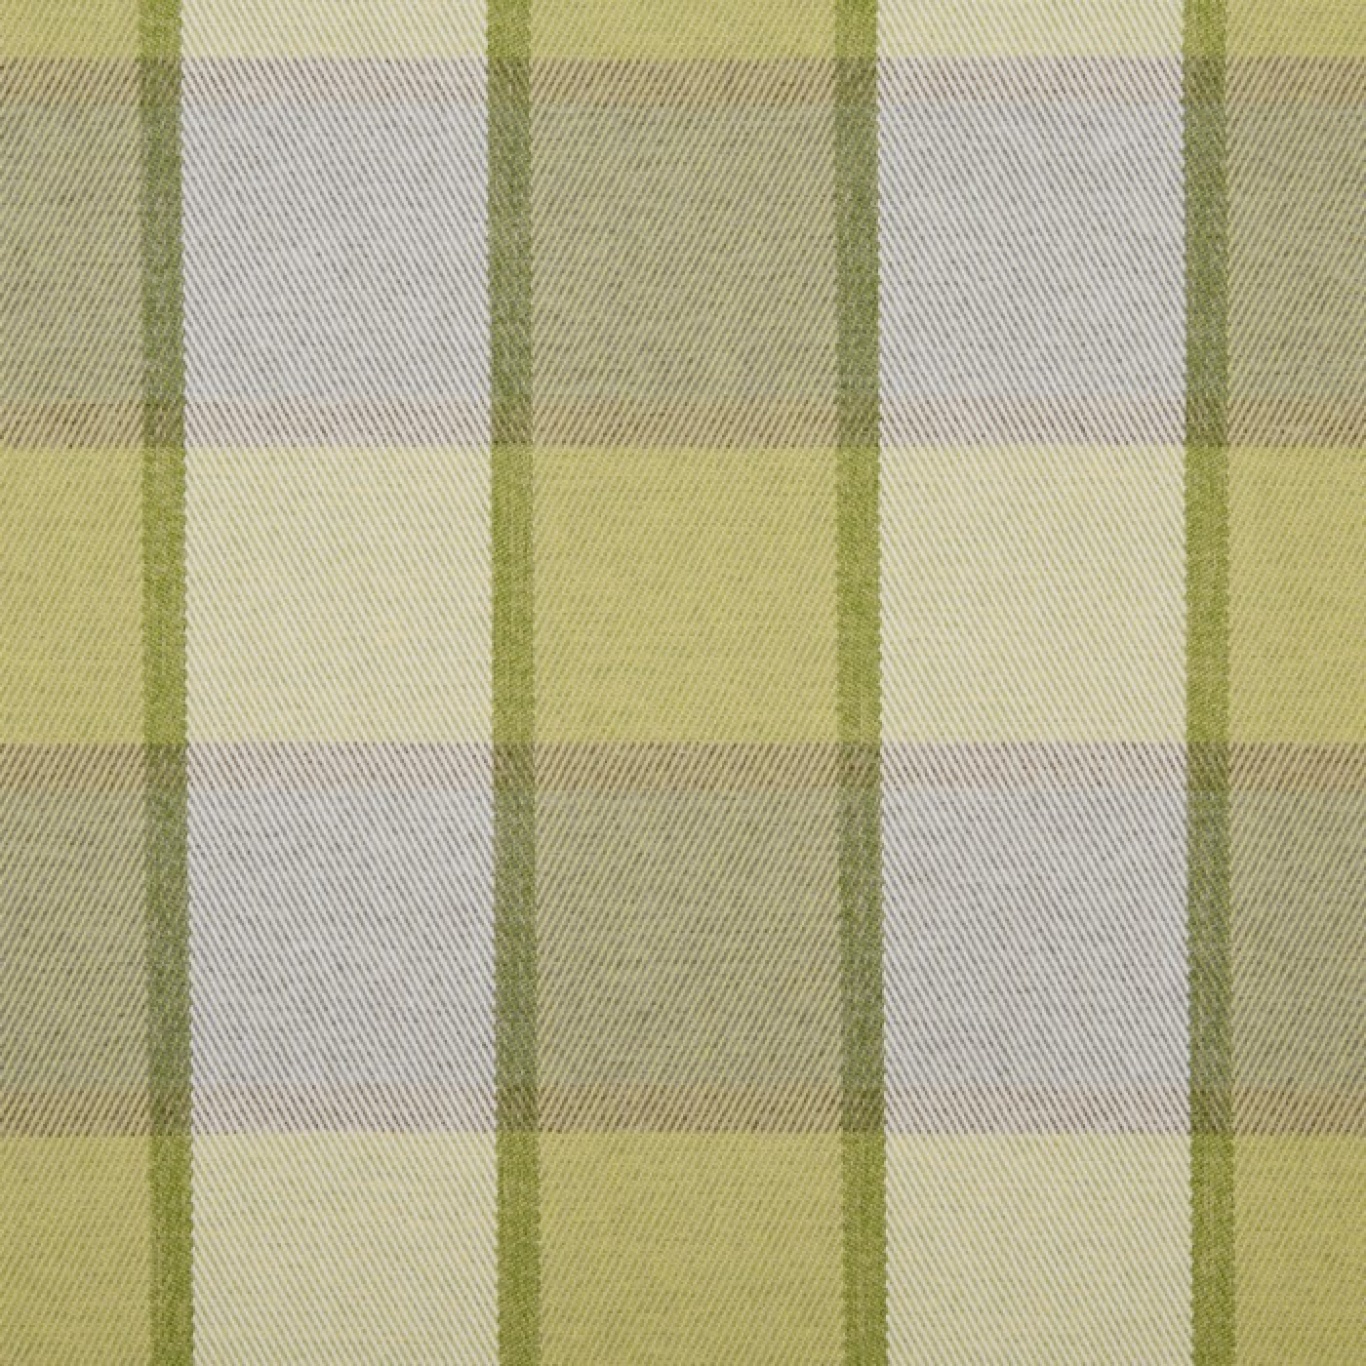 Image of Prestigious Solway Moss Fabric